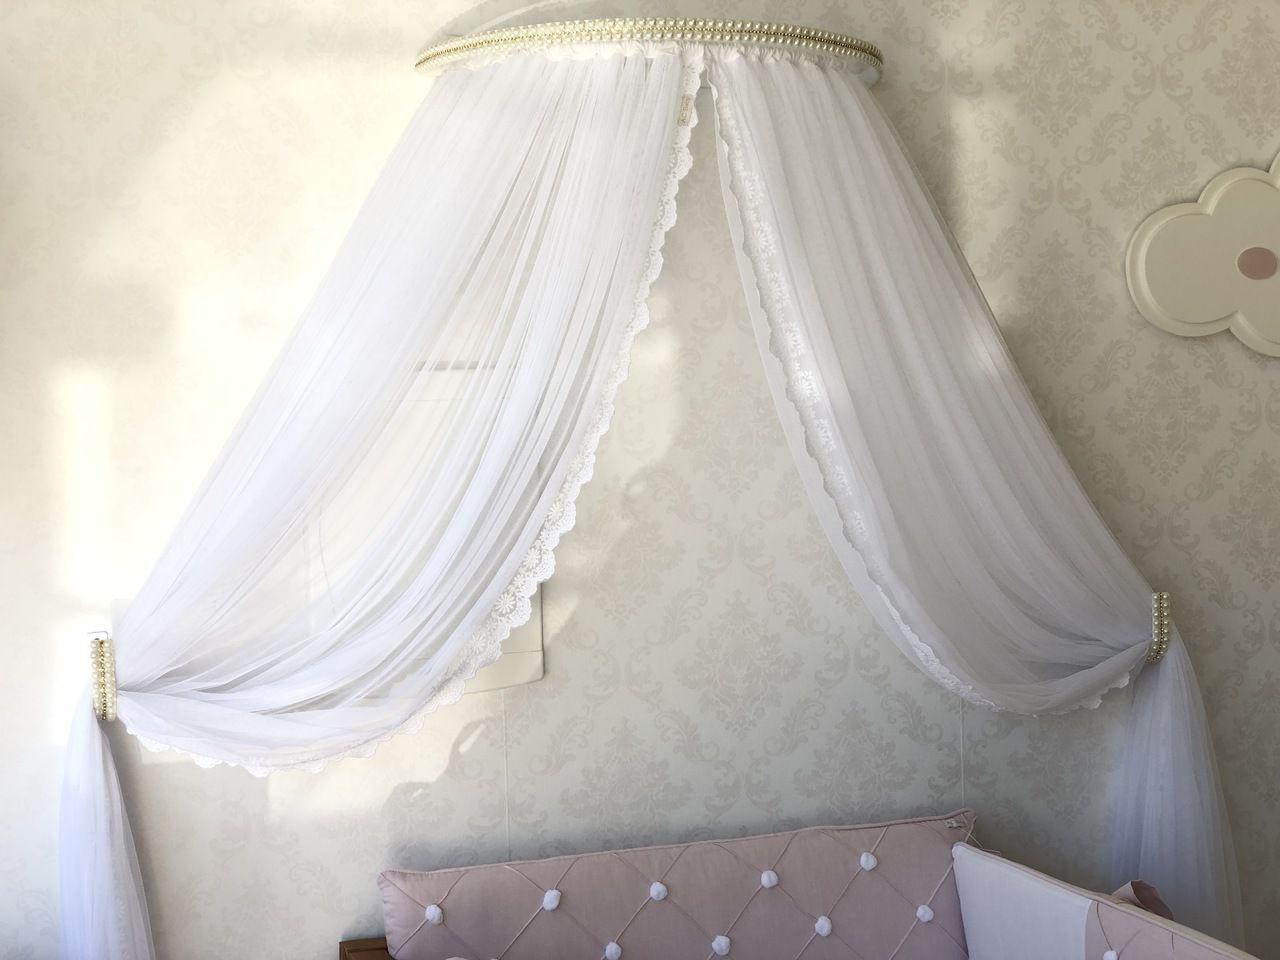 Mosquiteiro de Micro Tule Branco